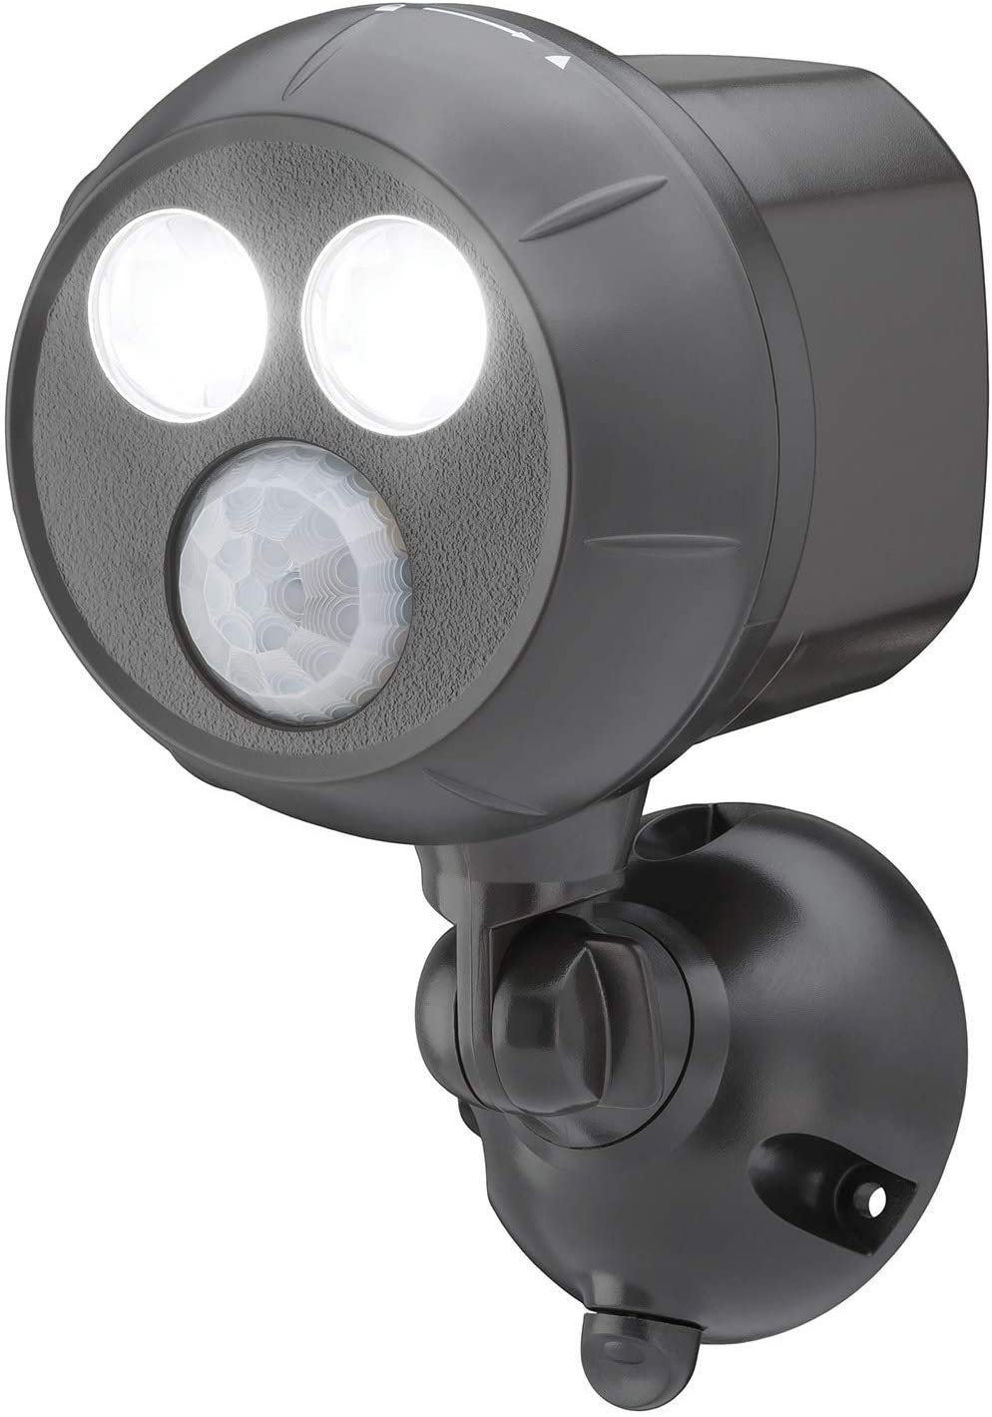 Mr Beams MB390 Weatherproof LED Spotlight Motion Sensing Battery Power 3 Pack